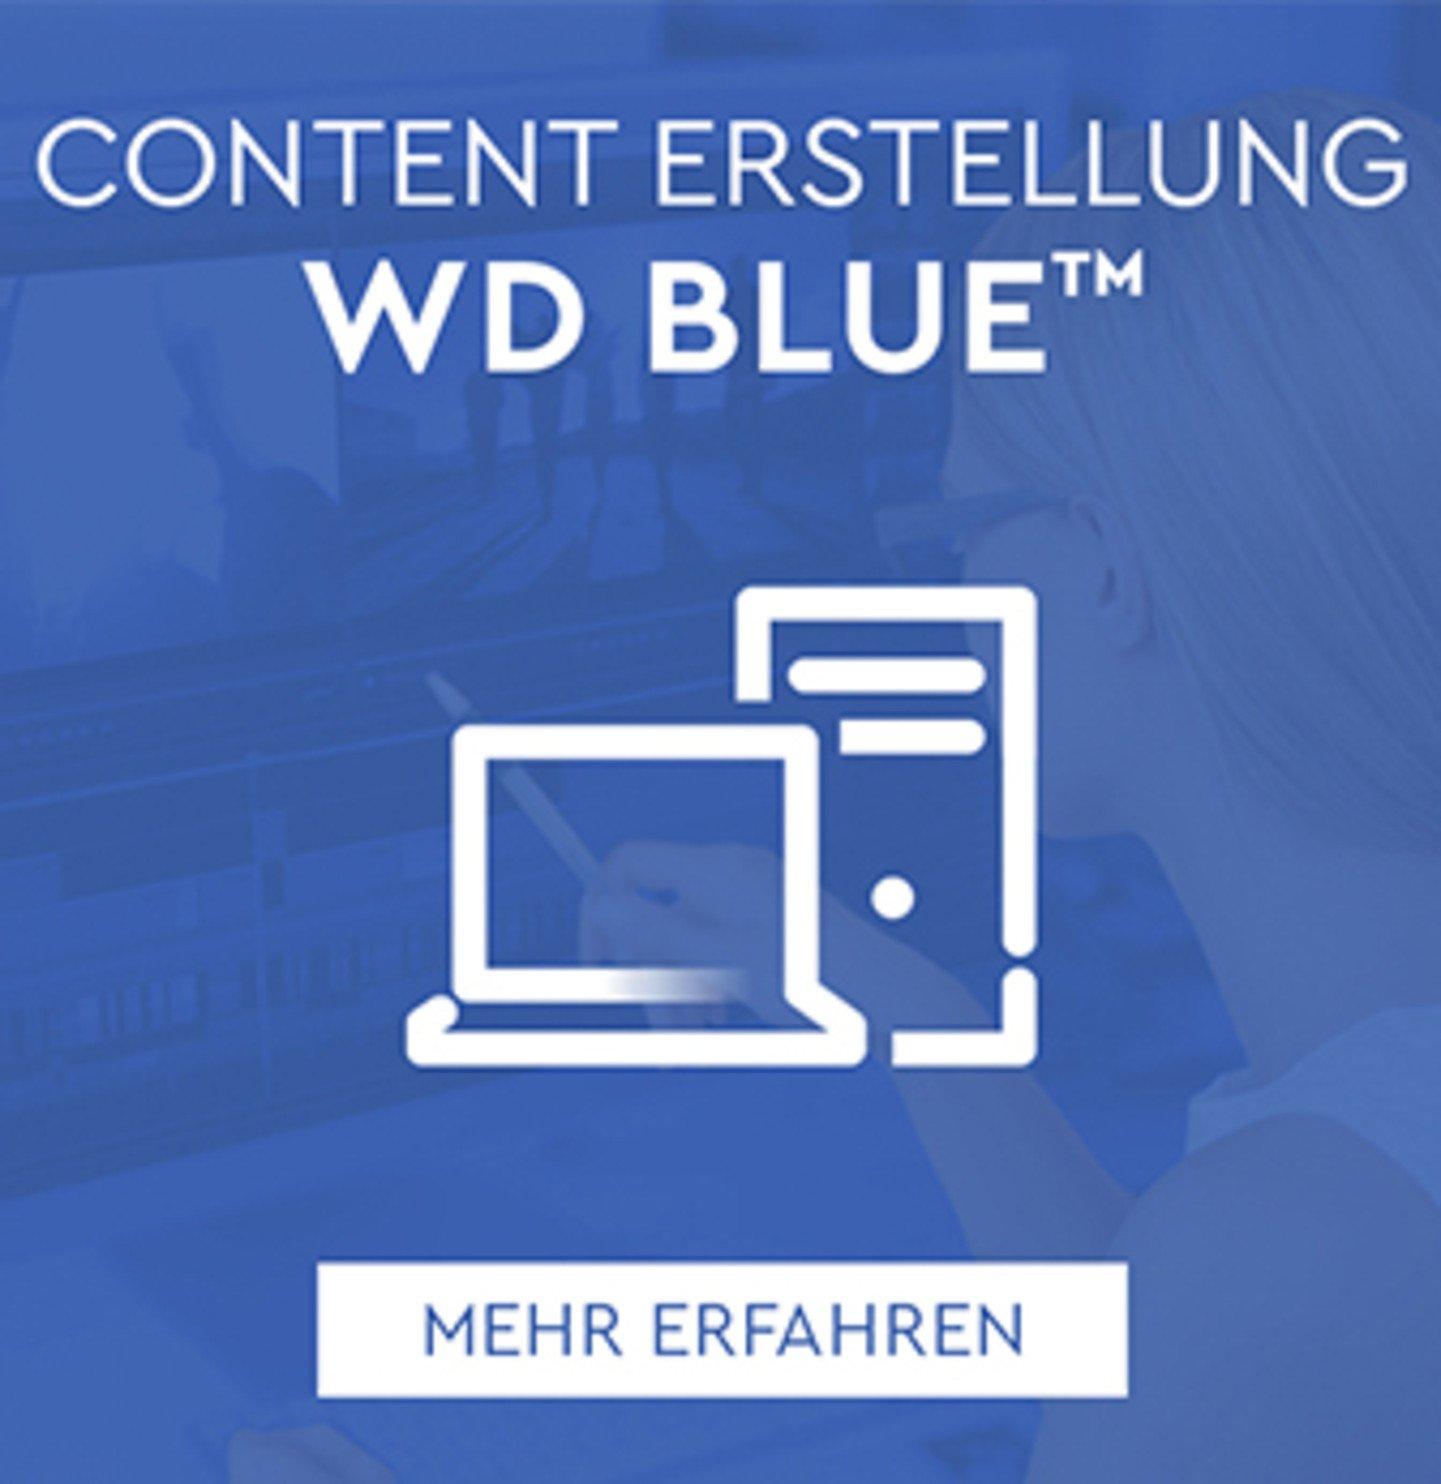 Content Erstellung – WD BLUE